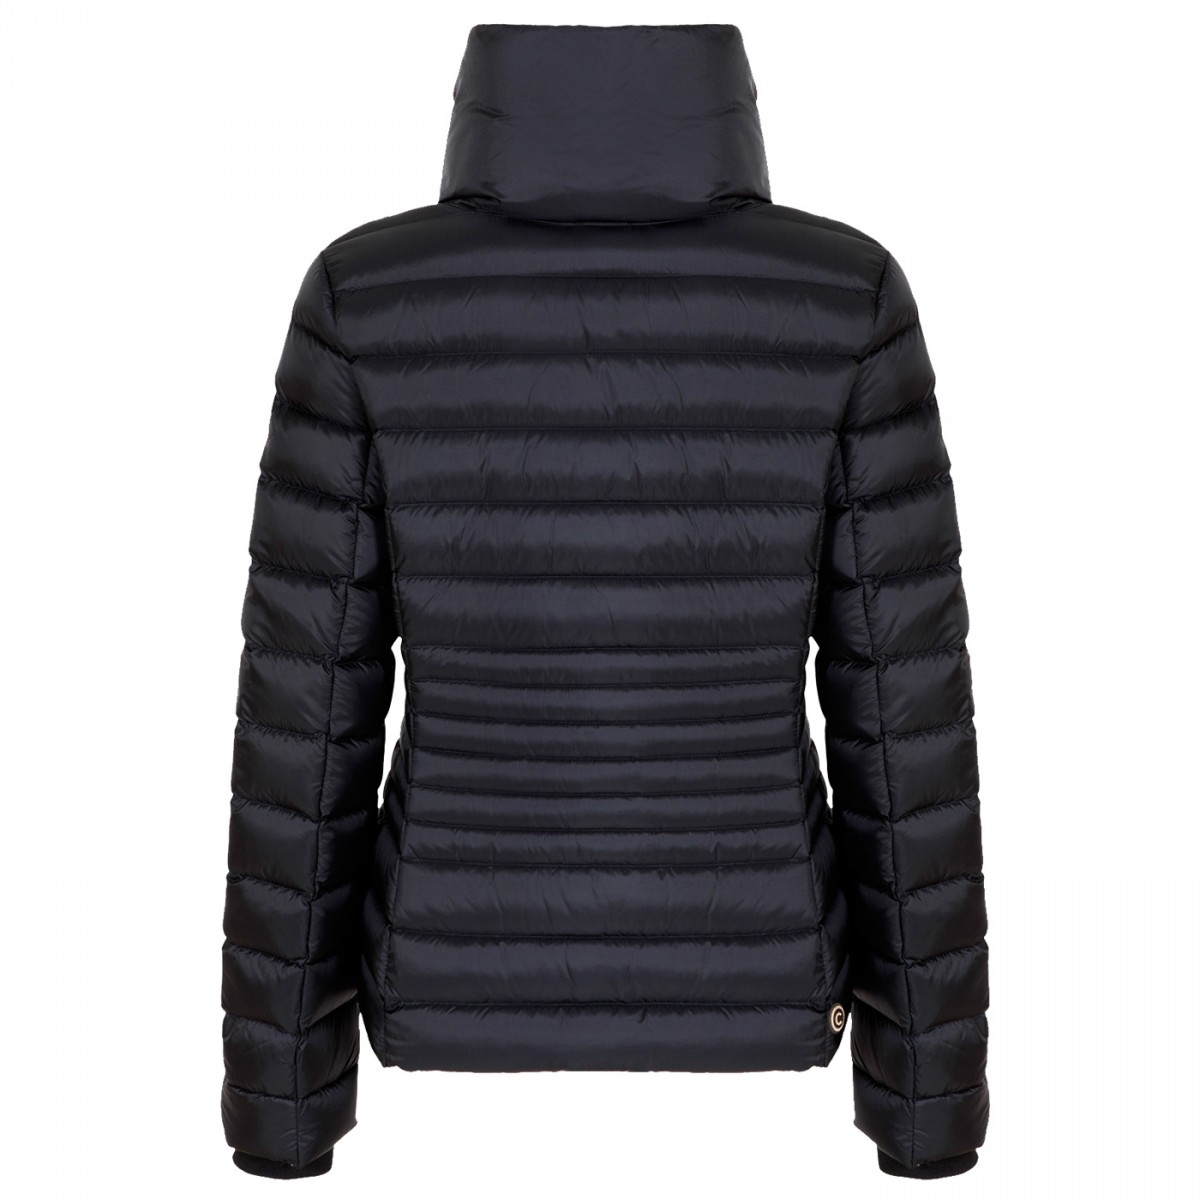 reputable site 3d8a6 bff33 Piumino Colmar Originals Place lucido Donna - Abbigliamento casual